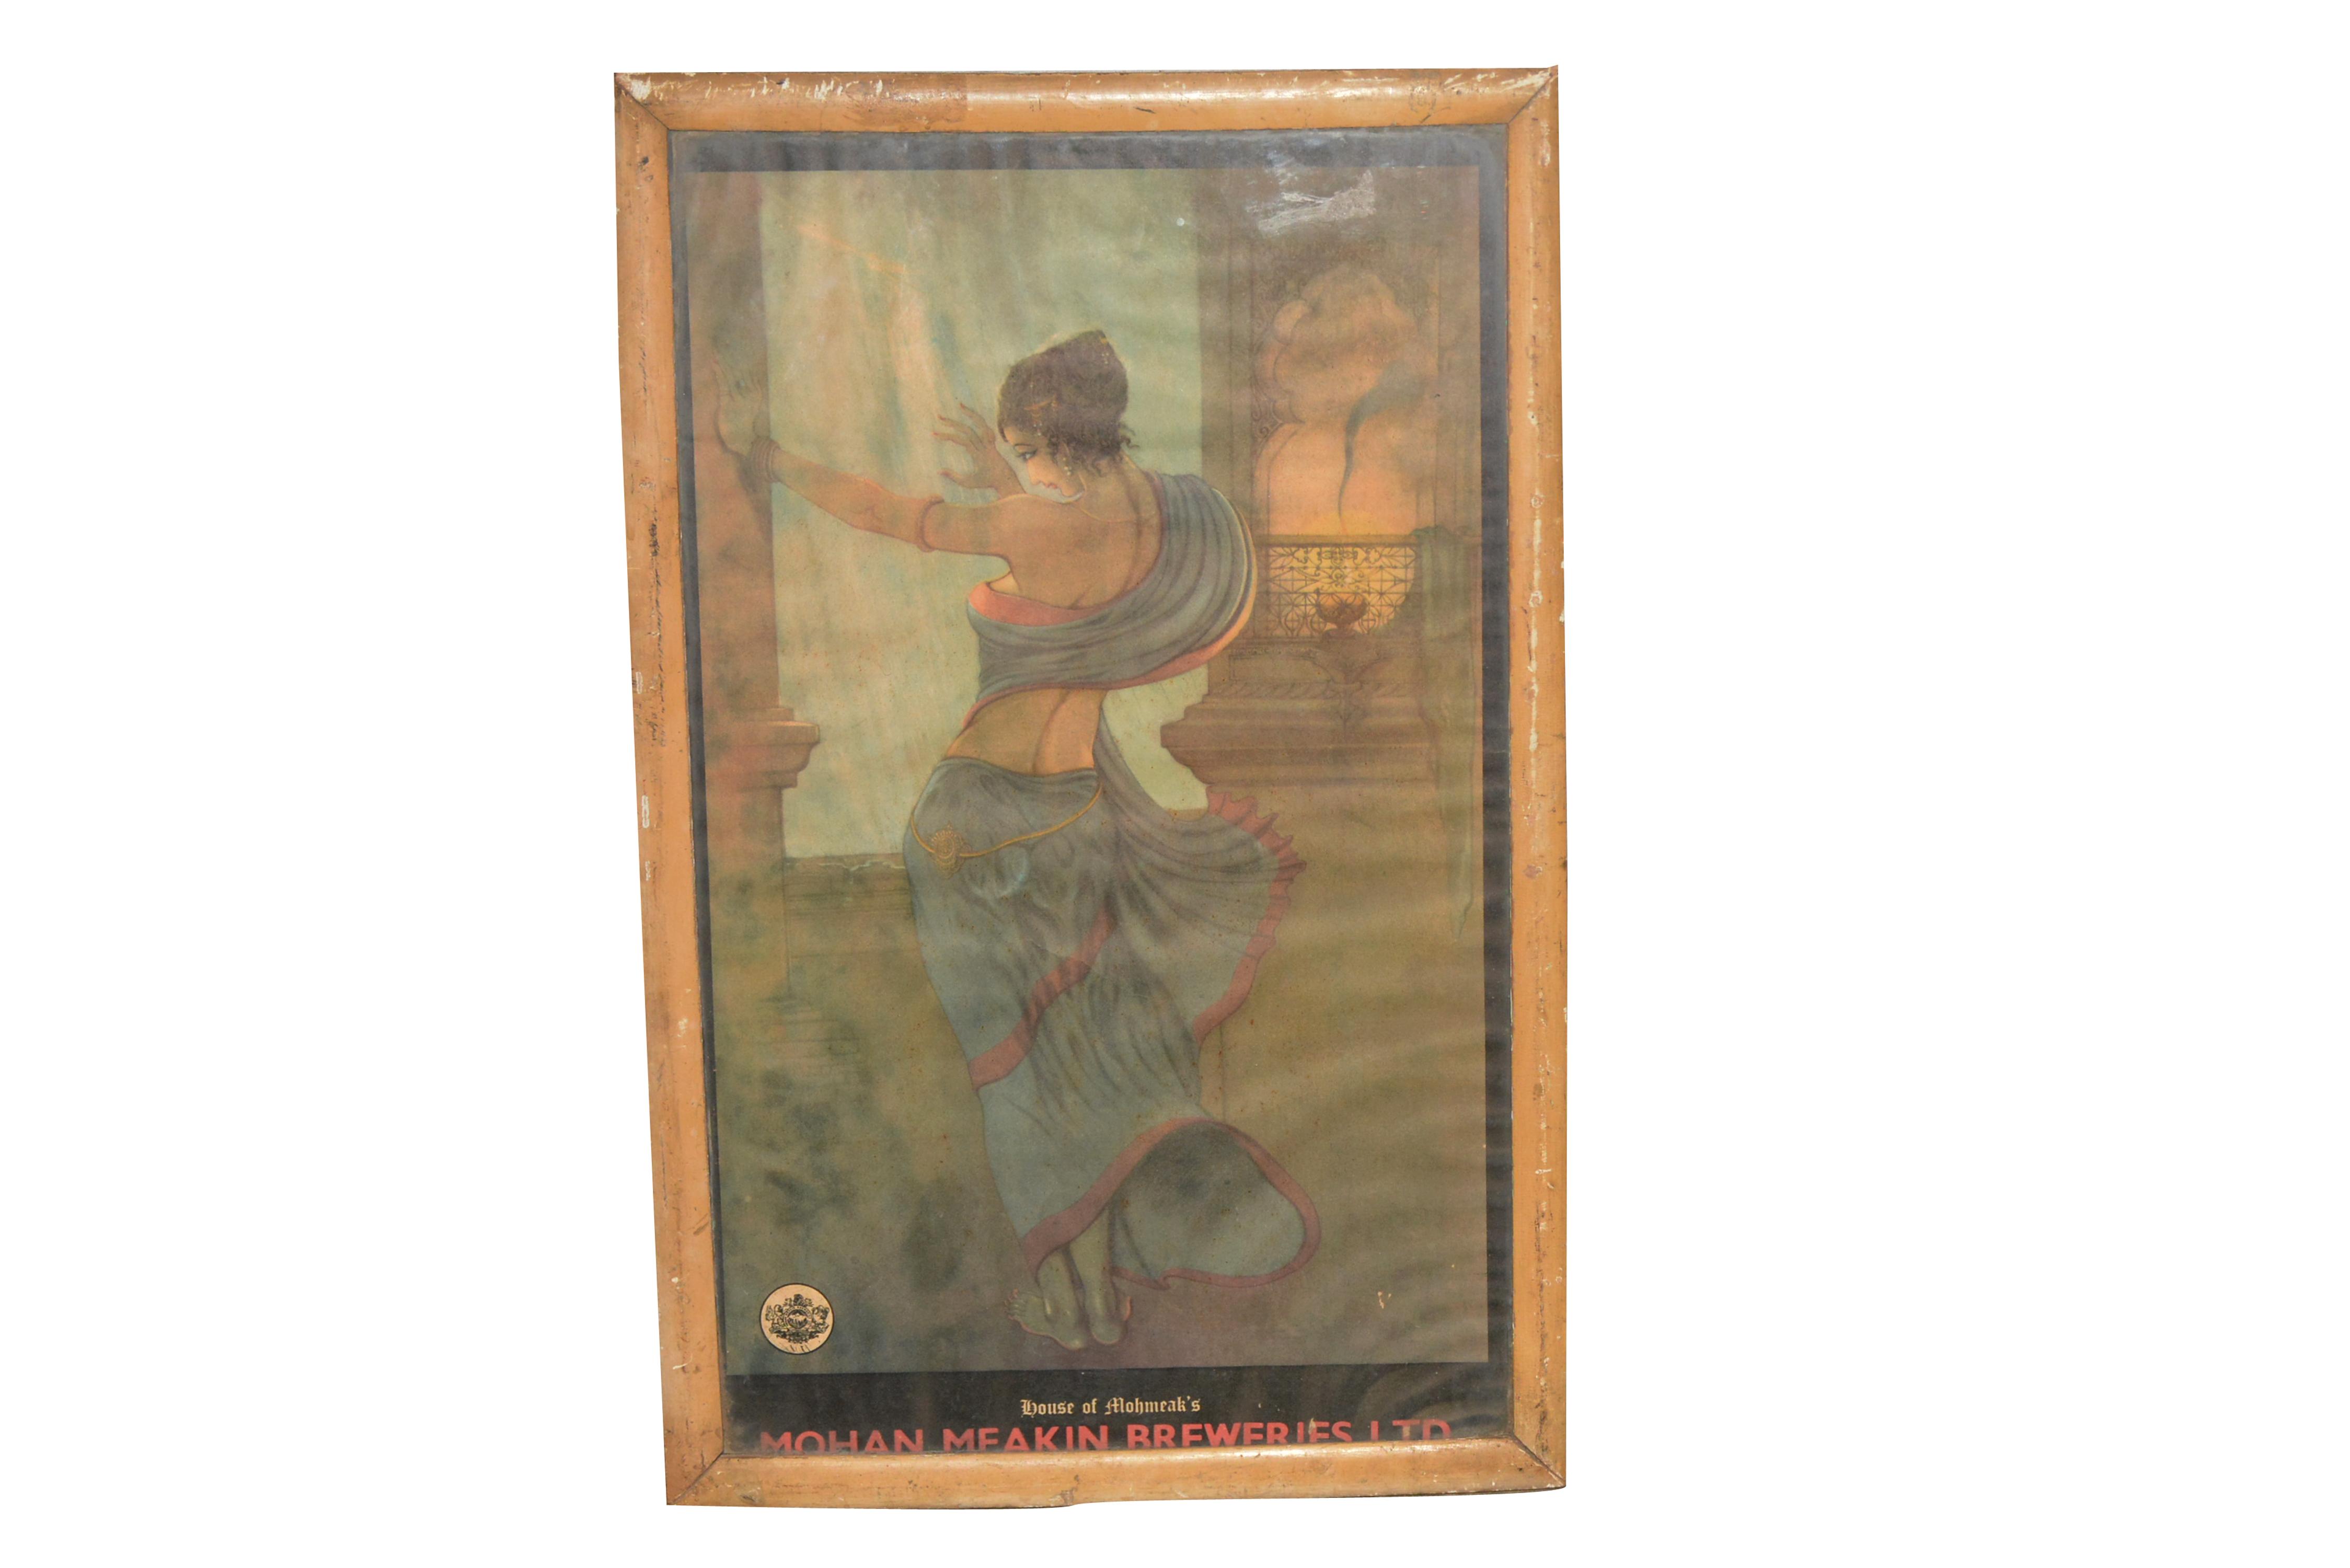 ANRA16107 - 32 x 2 x 52 cm